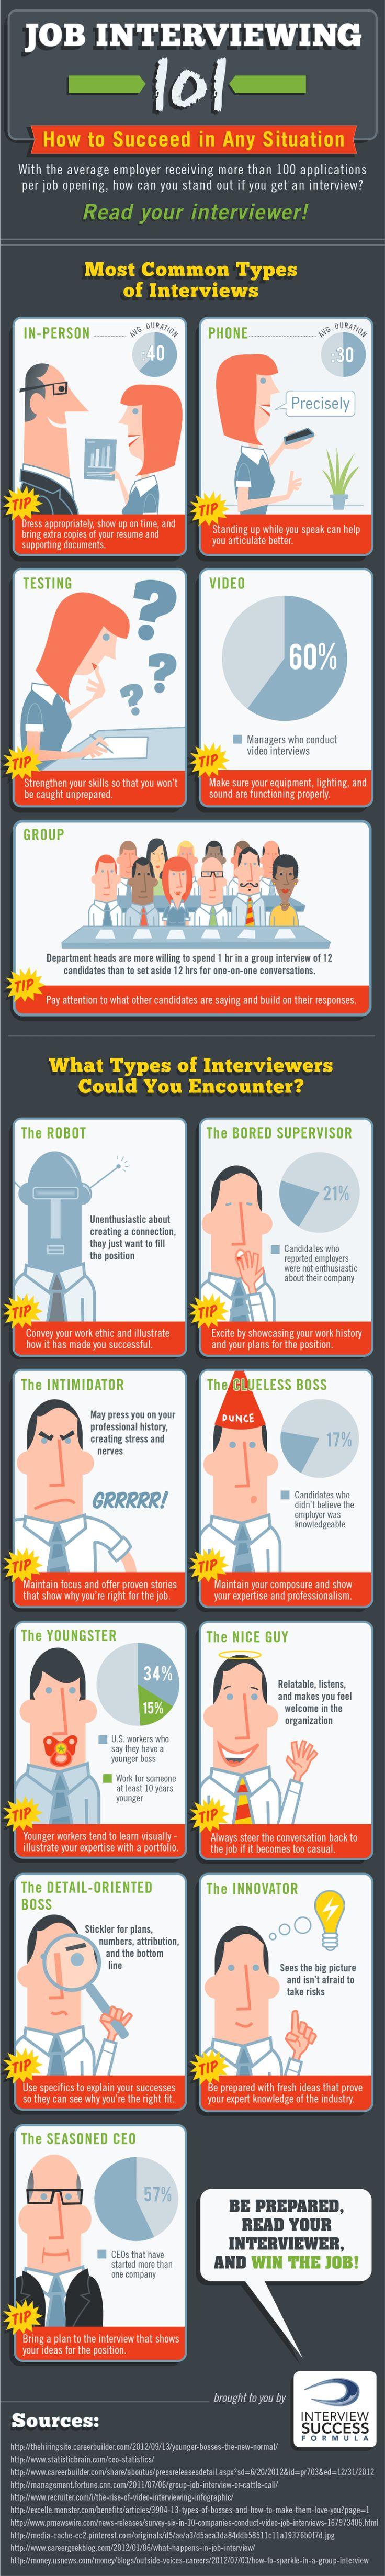 138 best Job Seekers images on Pinterest Job interviews Job